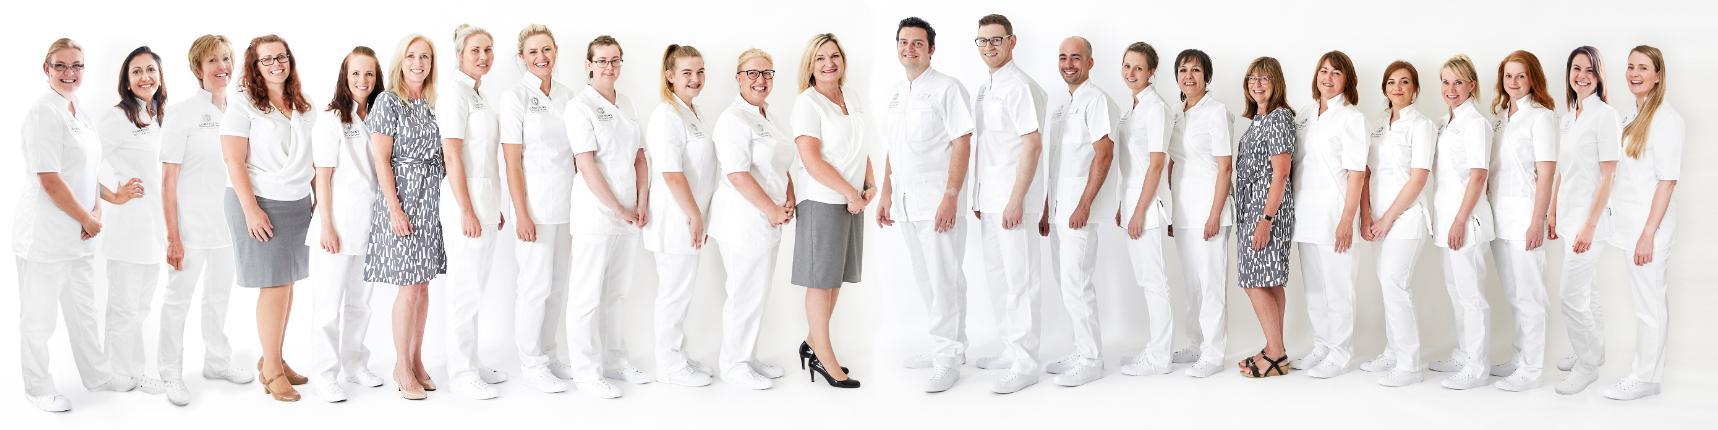 Confident Dental & Implant Clinic Stroud team photo